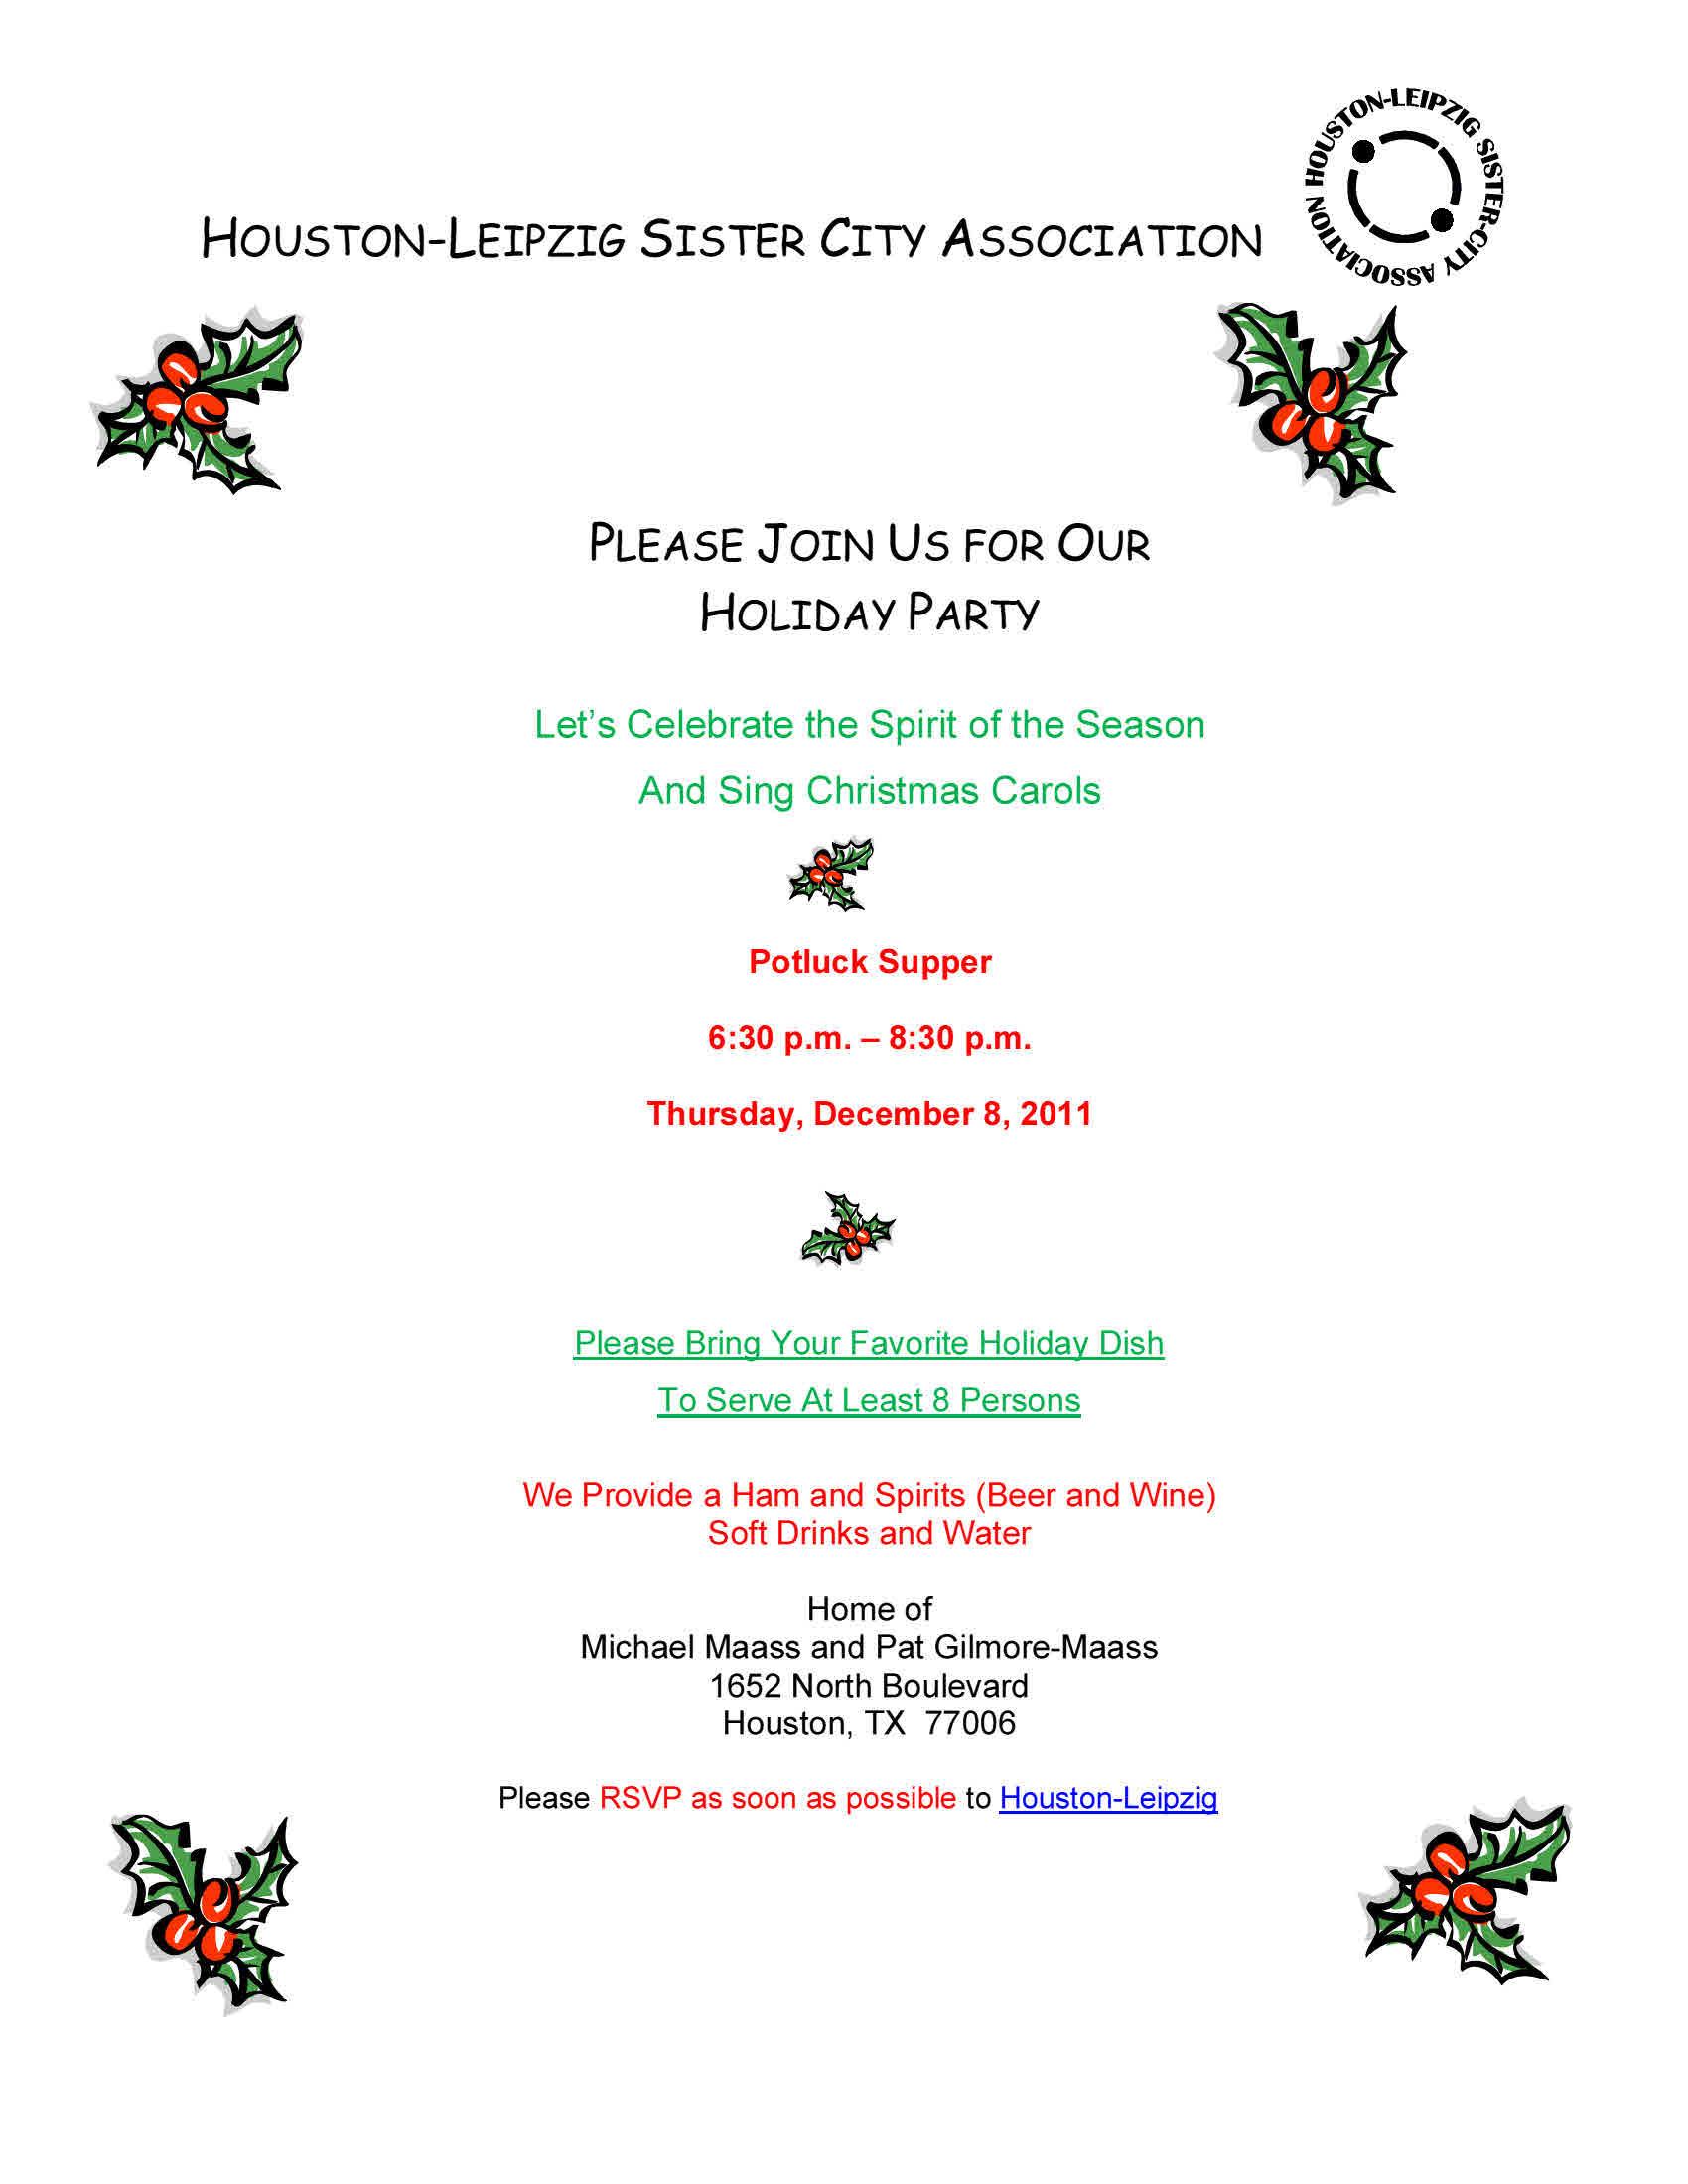 Copy of 2011 Holiday Party Invitation Website – Houston-Leipzig ...